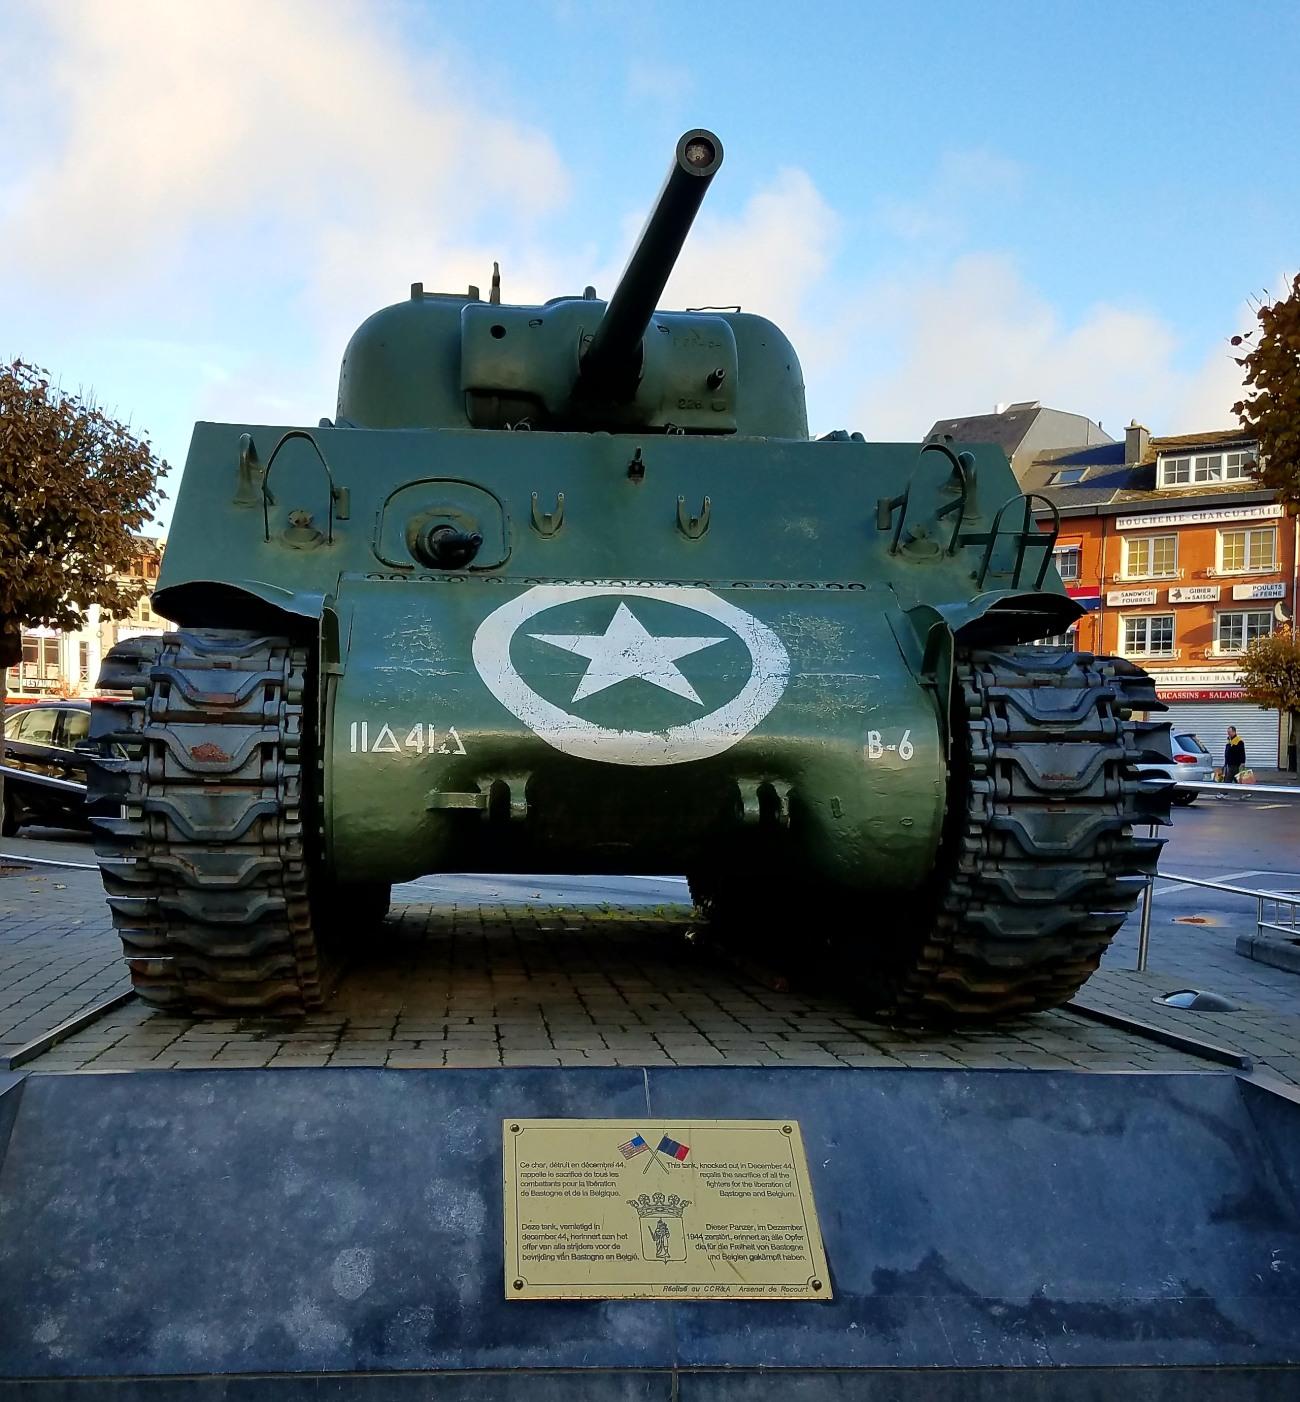 US M4 medium tank